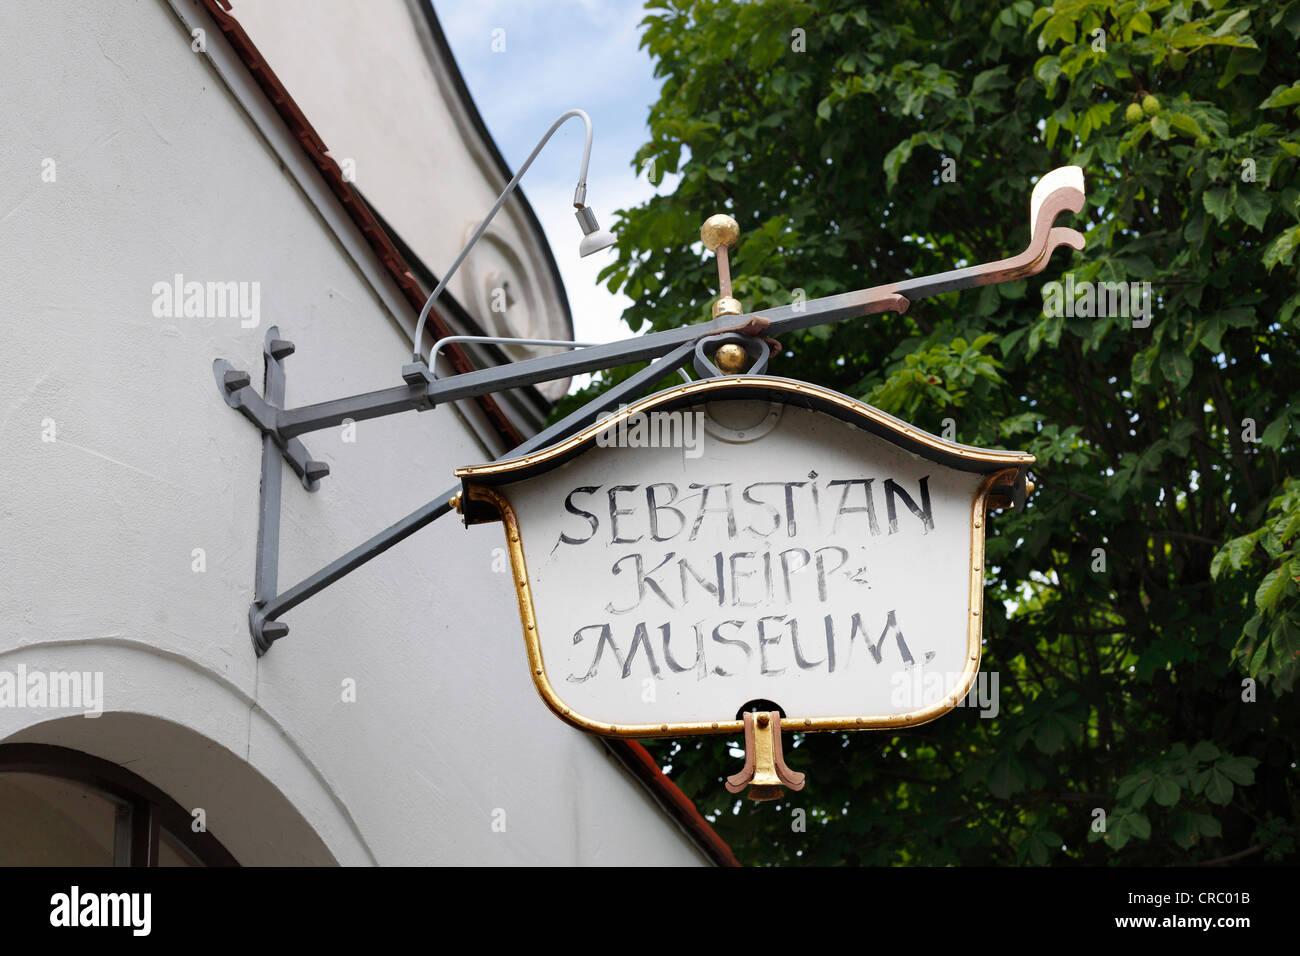 Kneipp Museum, Bad Woerishofen, Lower Allgaeu, Allgaeu, Swabia, Bavaria, Germany, Europe, PublicGround Stock Photo